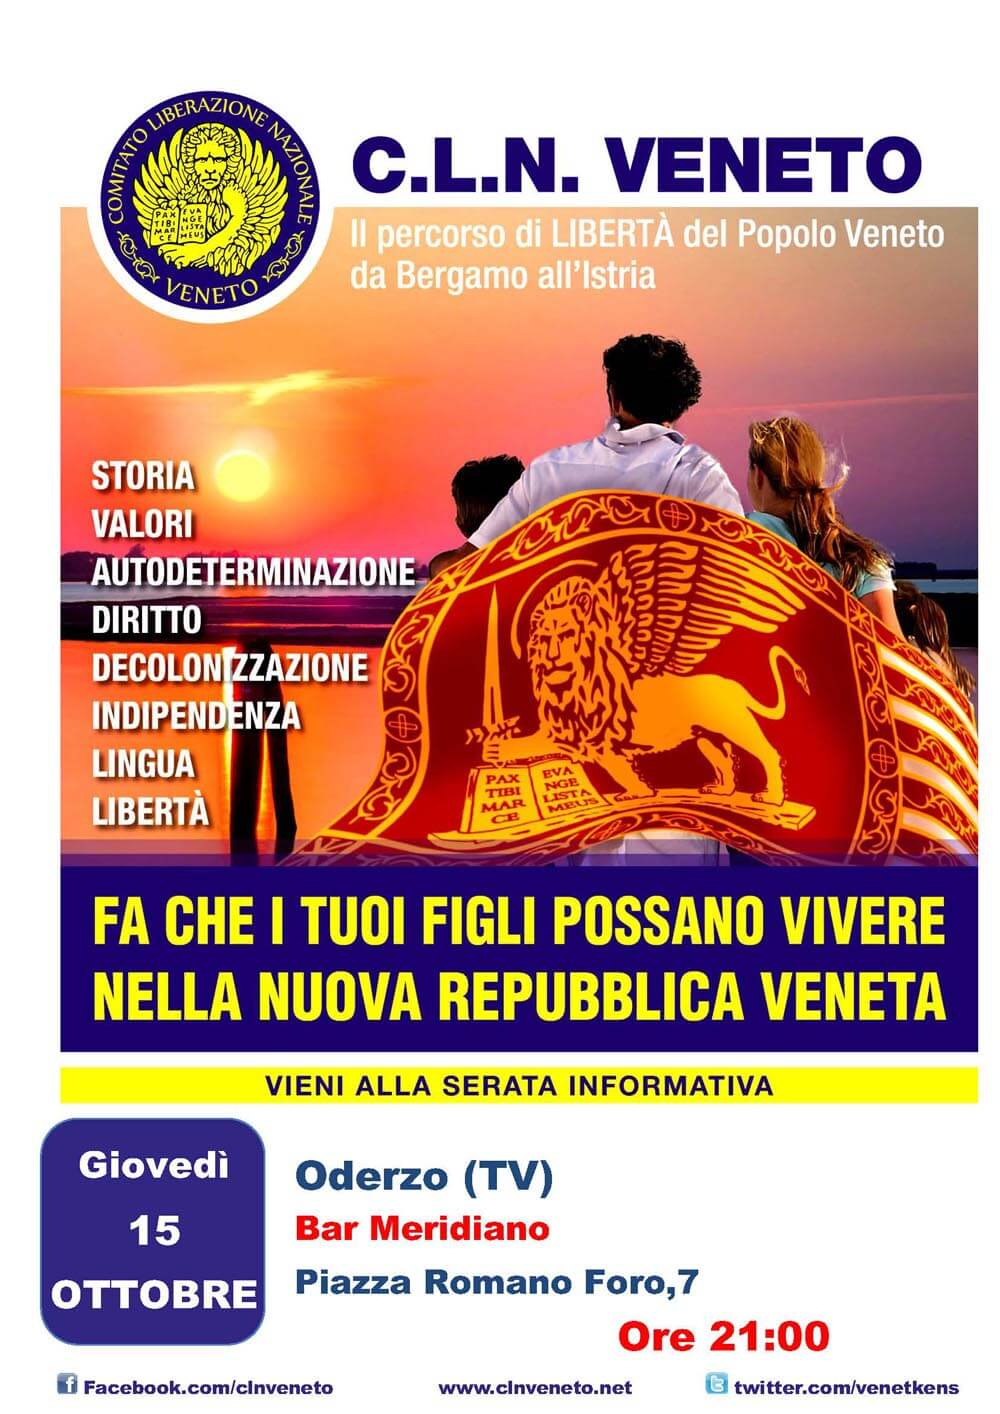 Oderzo (TV) @ Bar Meridiano